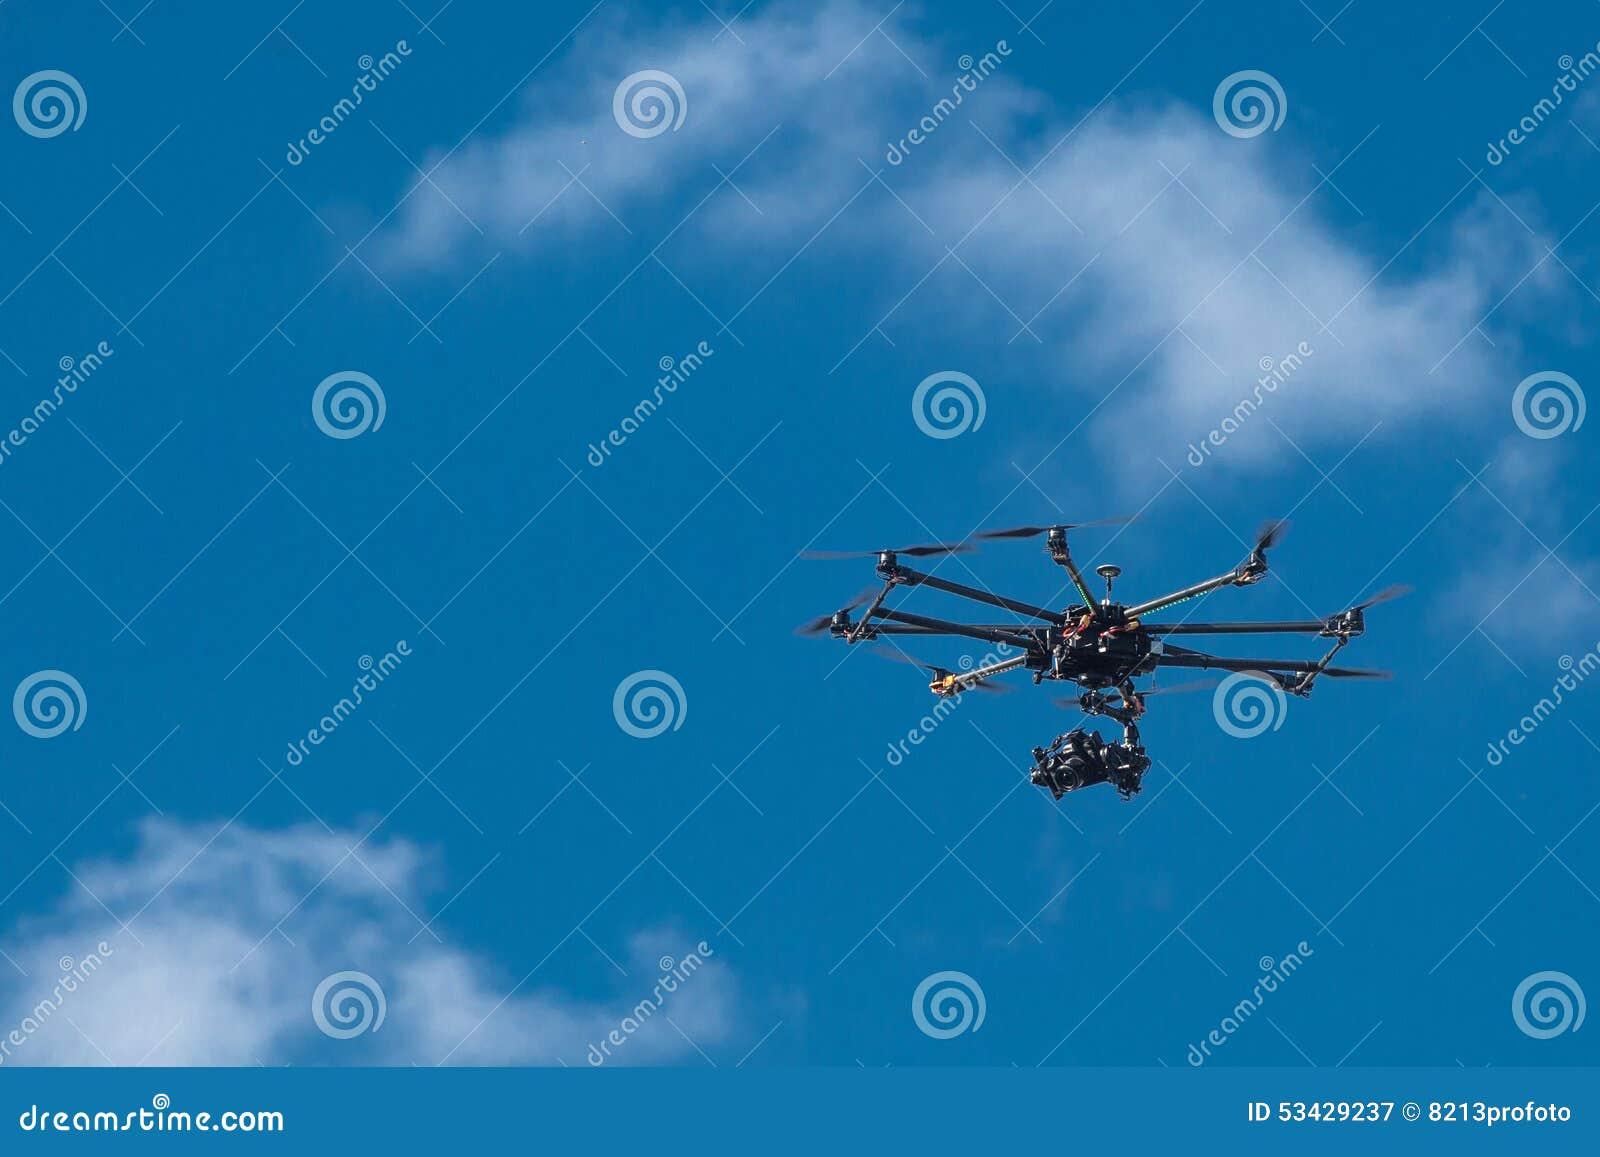 Drone, UAV , Multirotor Photography Helicopter